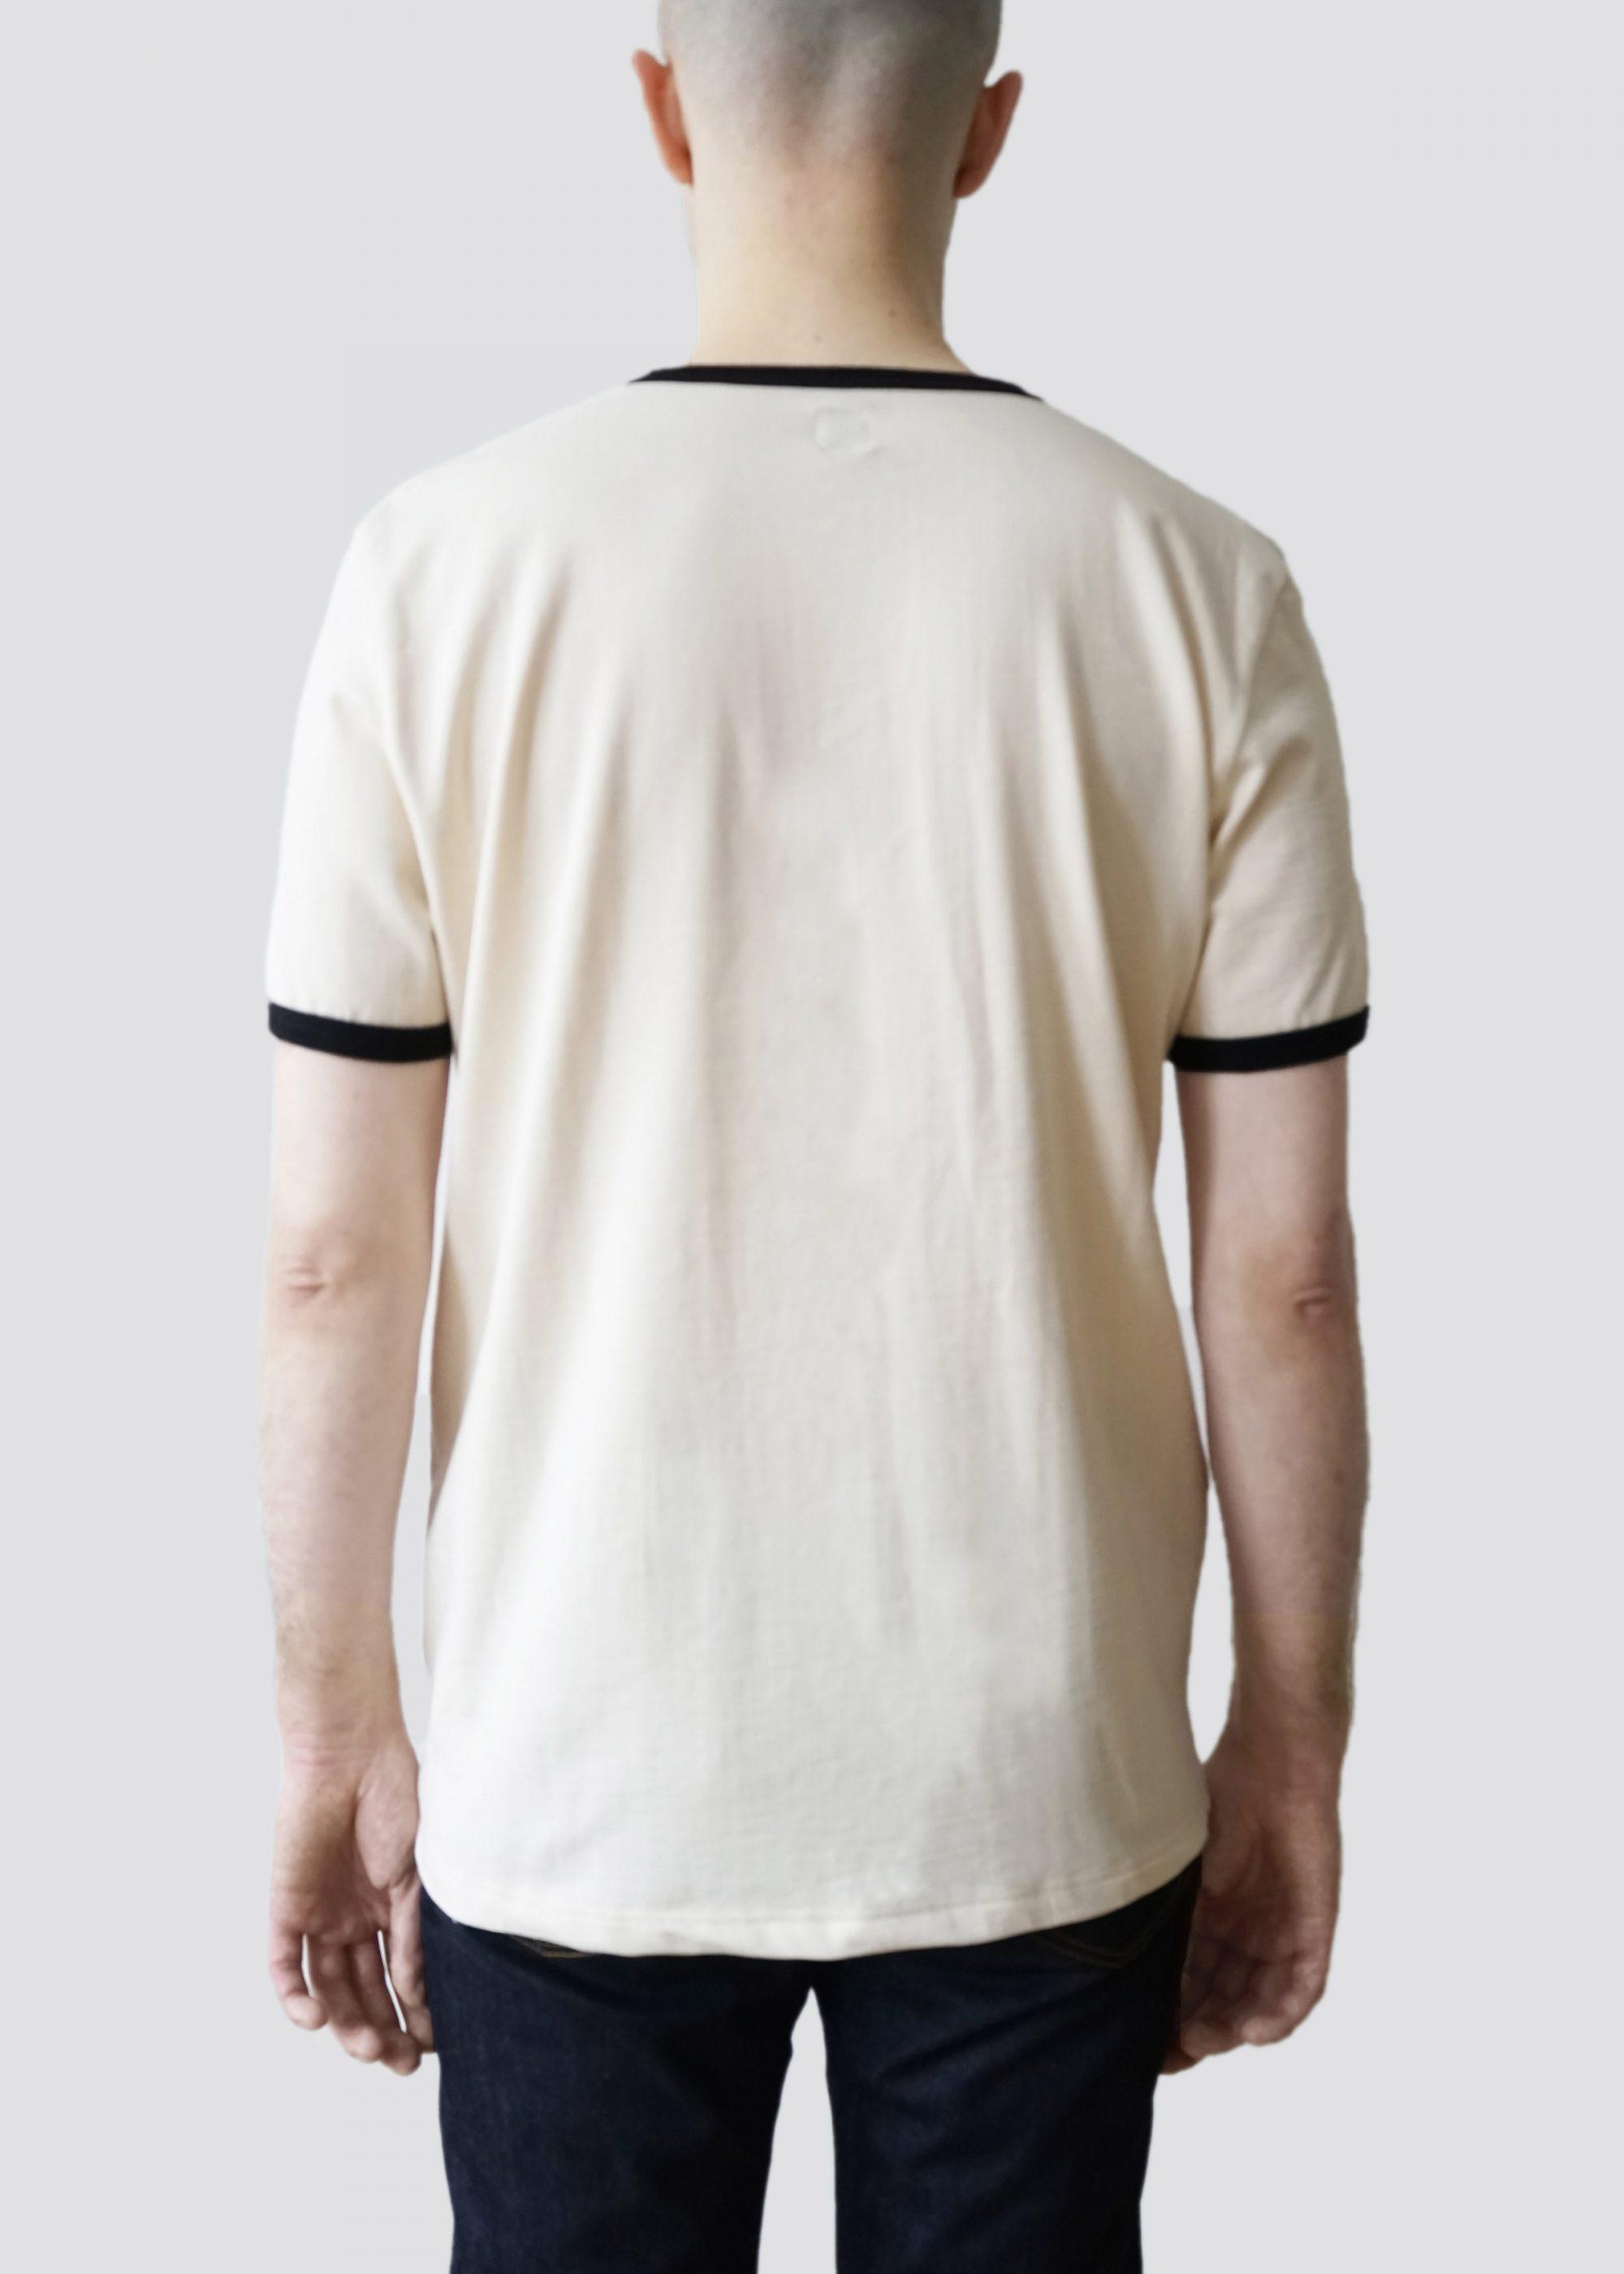 Product image for N° CJA1 Lennon